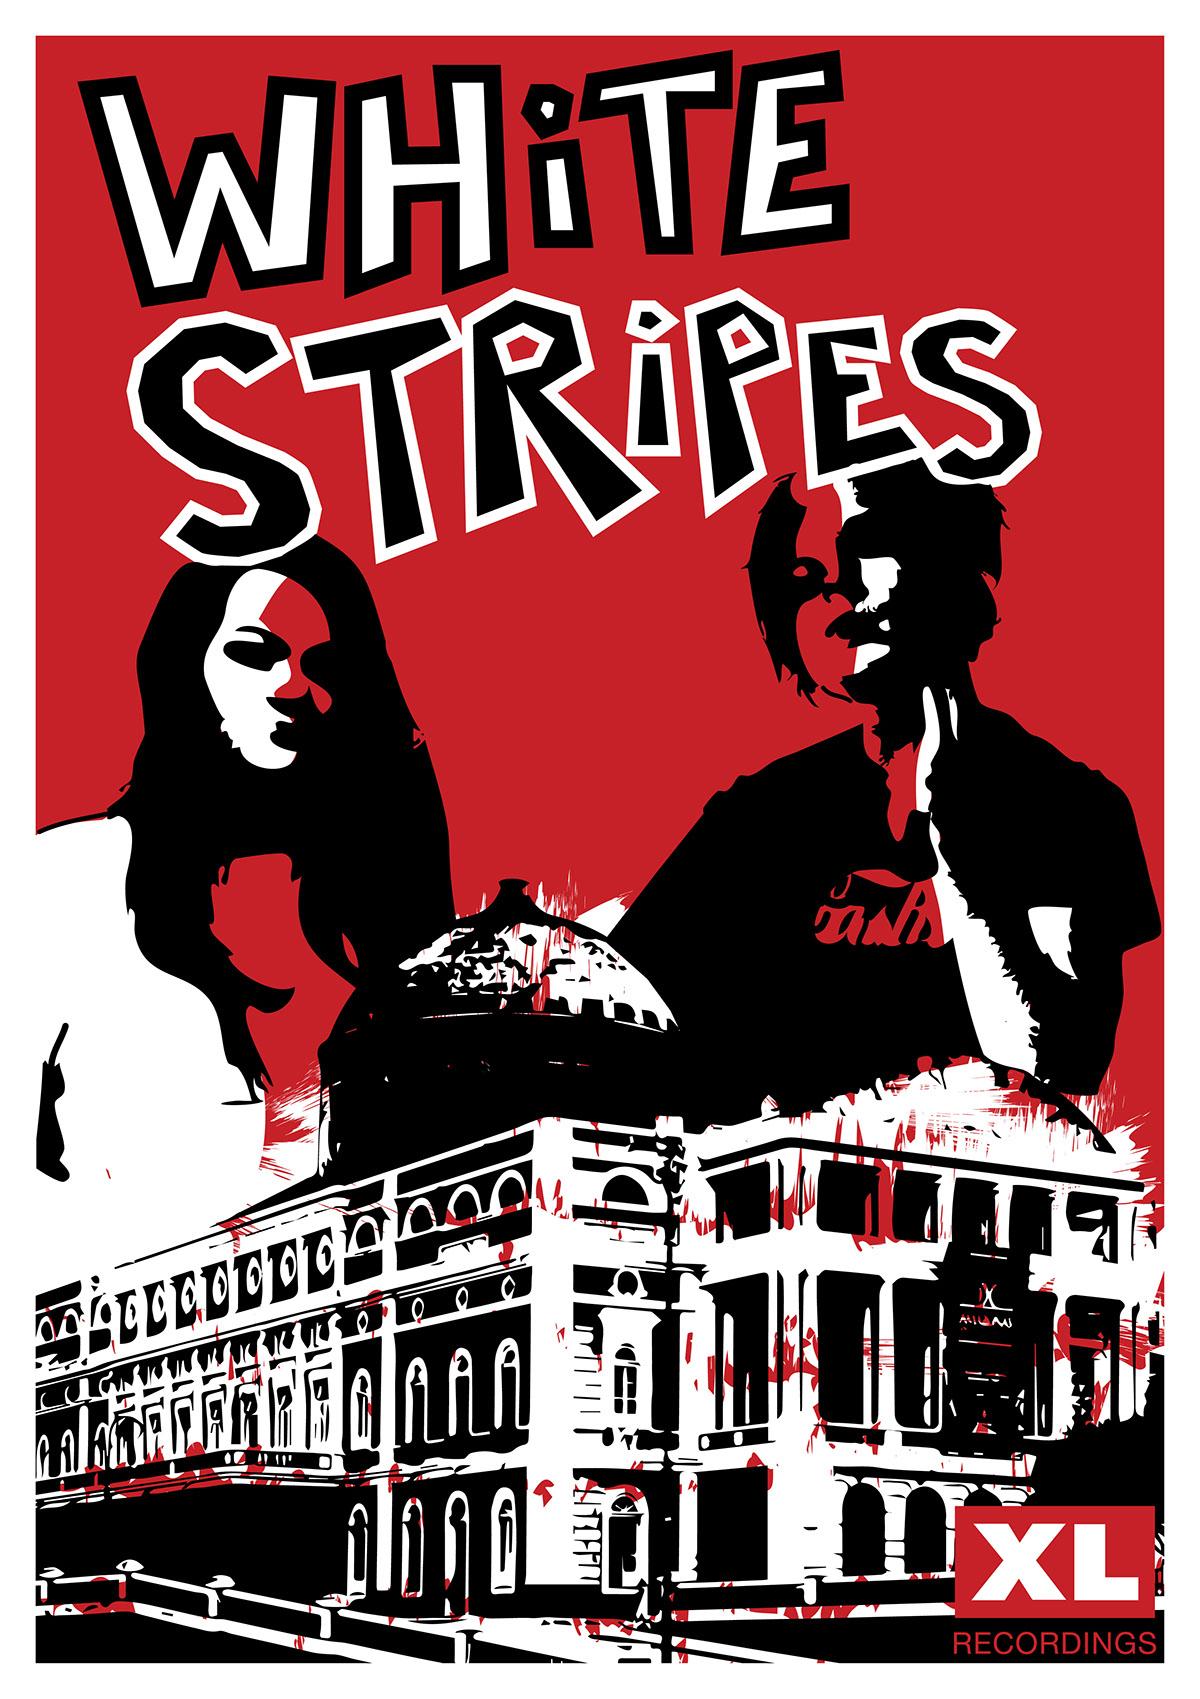 Xl Recordings White Stripes Poster Unit 2 On Behance